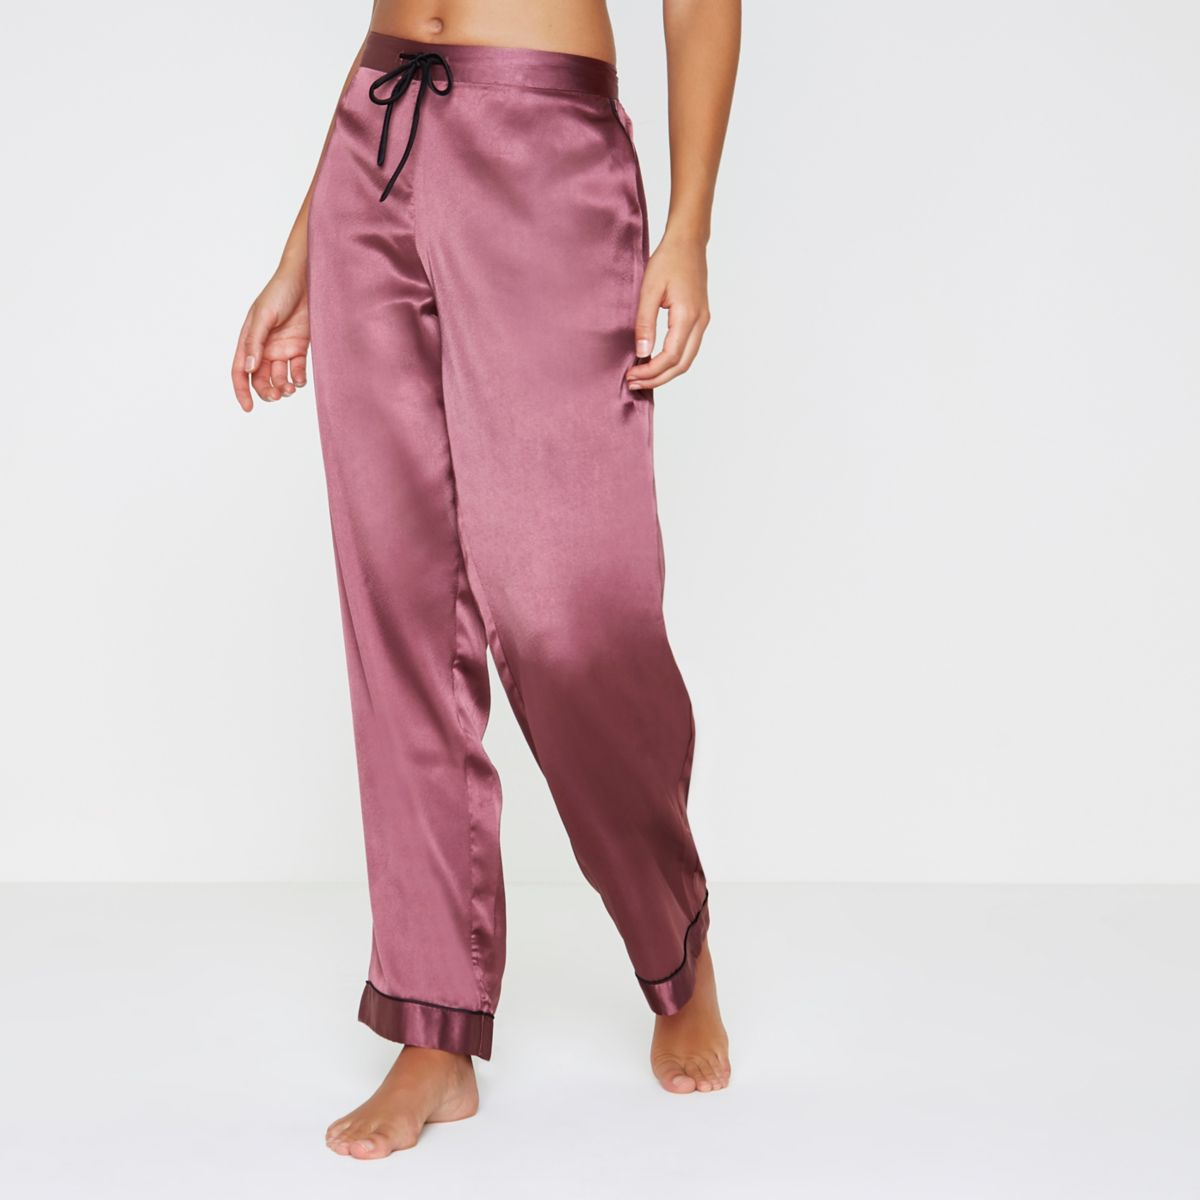 Dark red satin pajama bottoms